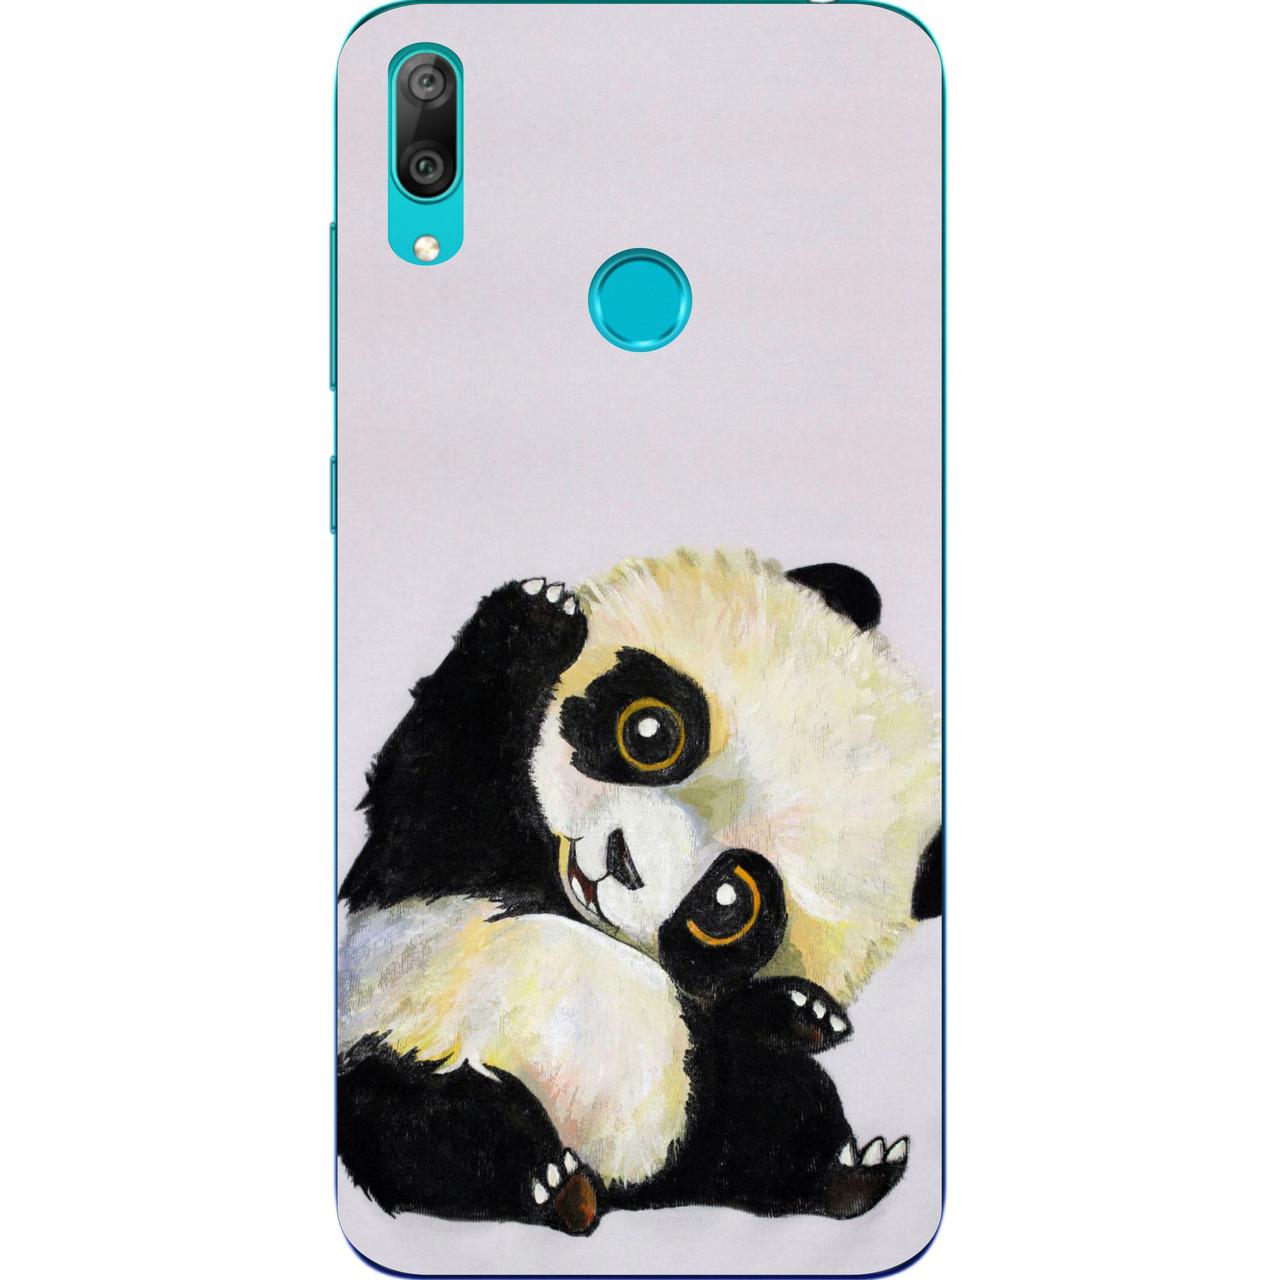 Чохол бампер для Huawei Y7 2019 з принтом Панда